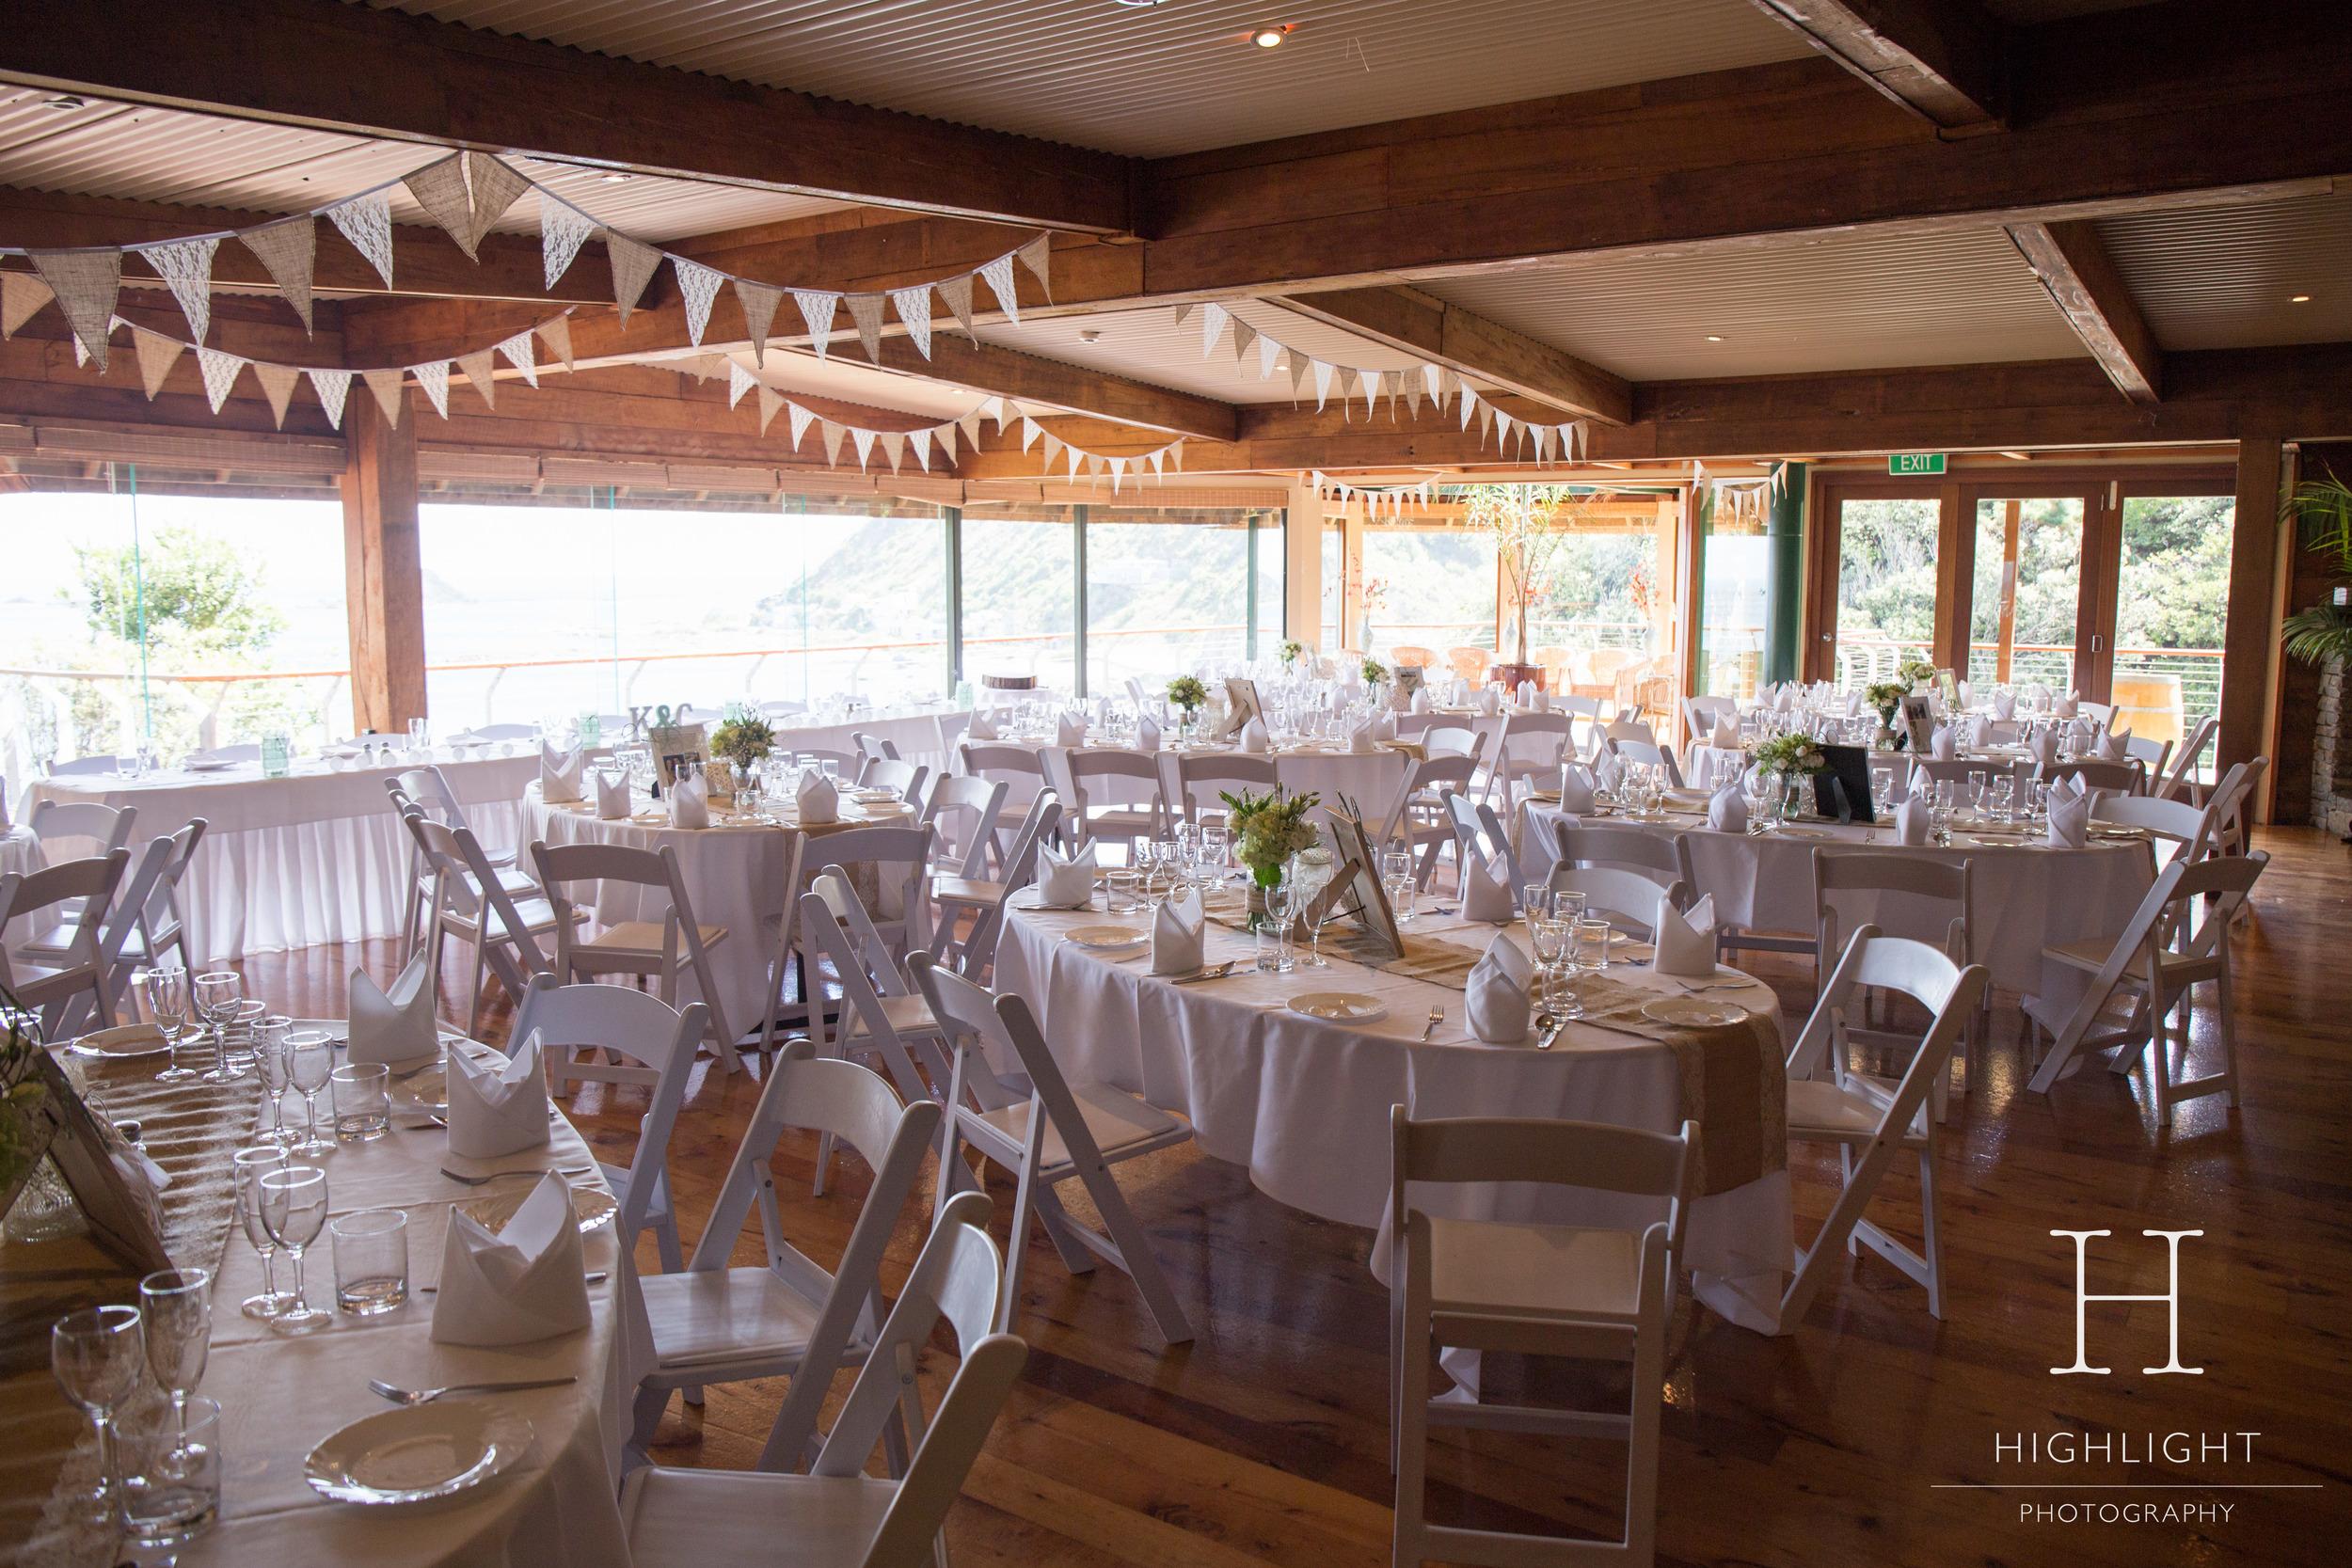 highlight_photography_wedding_new_zealand_venue.jpg